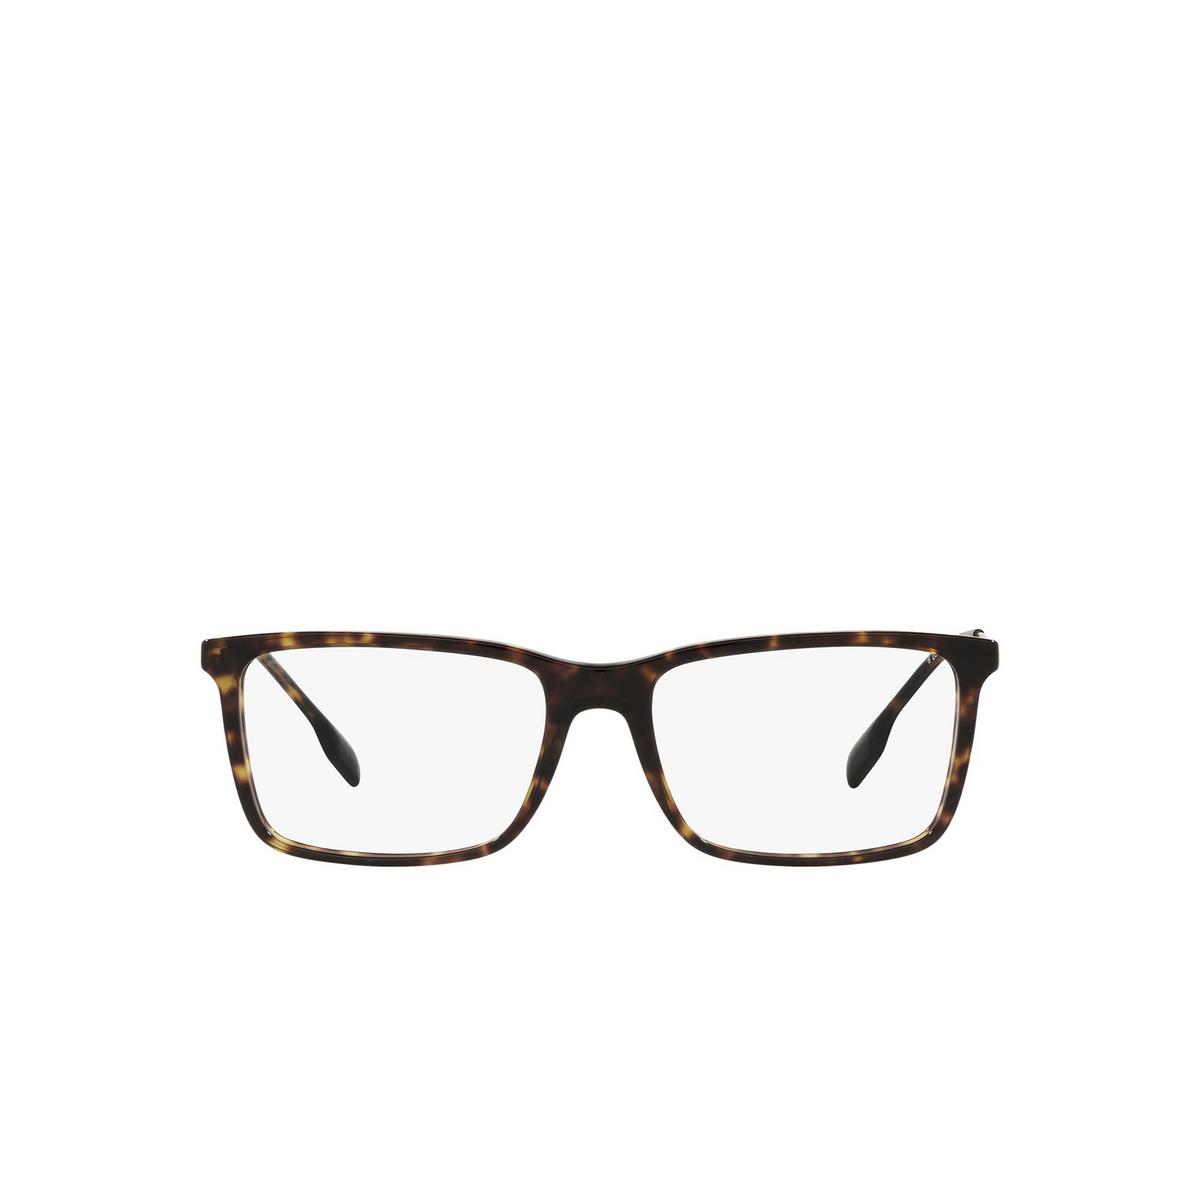 Burberry® Rectangle Eyeglasses: Harrington BE2339 color Dark Havana 3002 - front view.